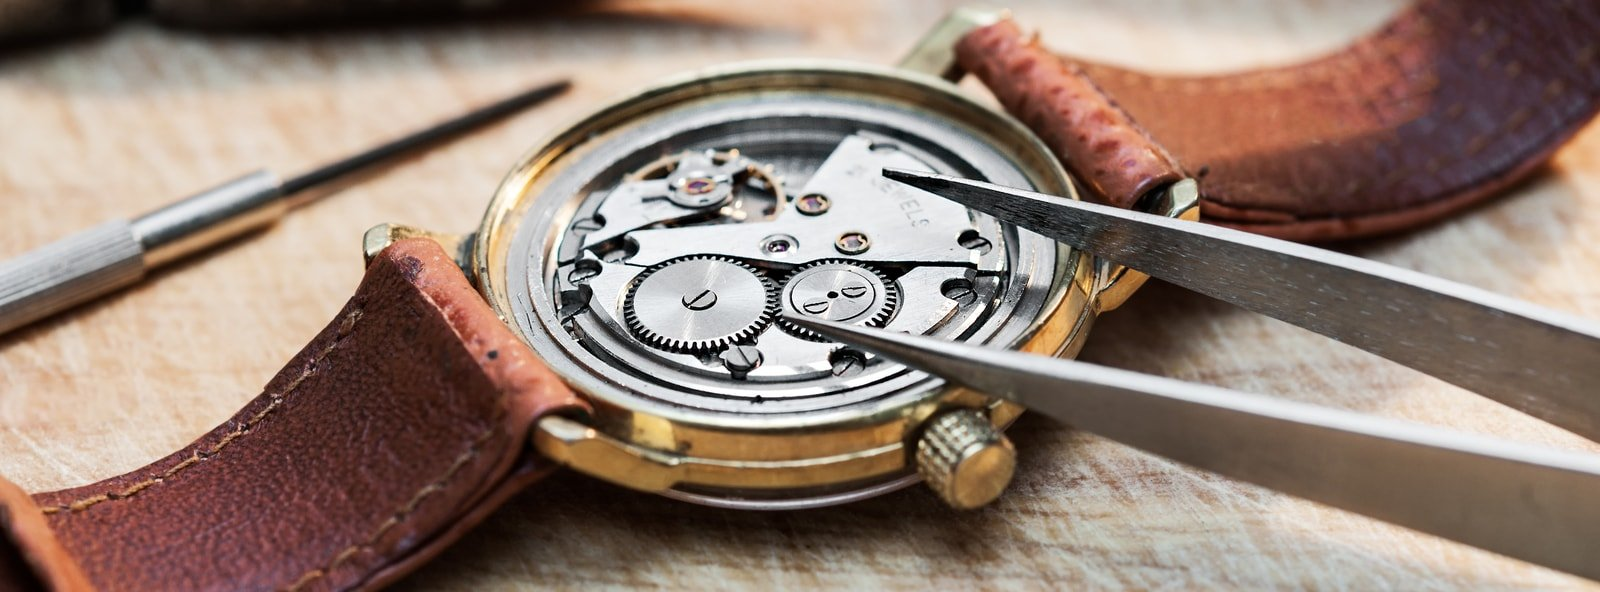 kit riparazione orologi